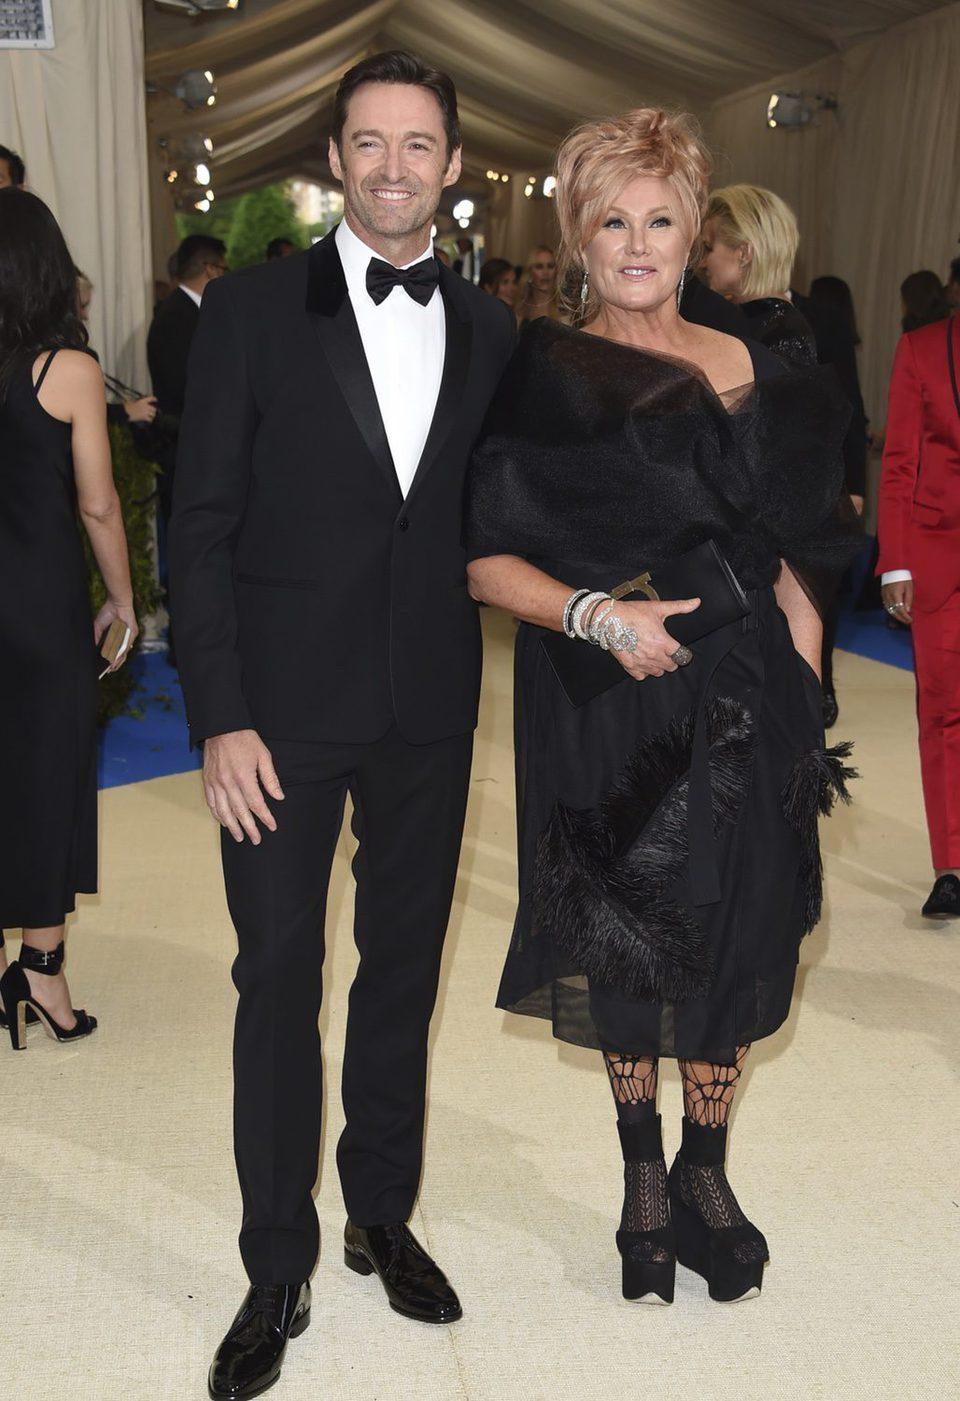 Hugh Jackman an his wife on the Met Gala red carpet 2017